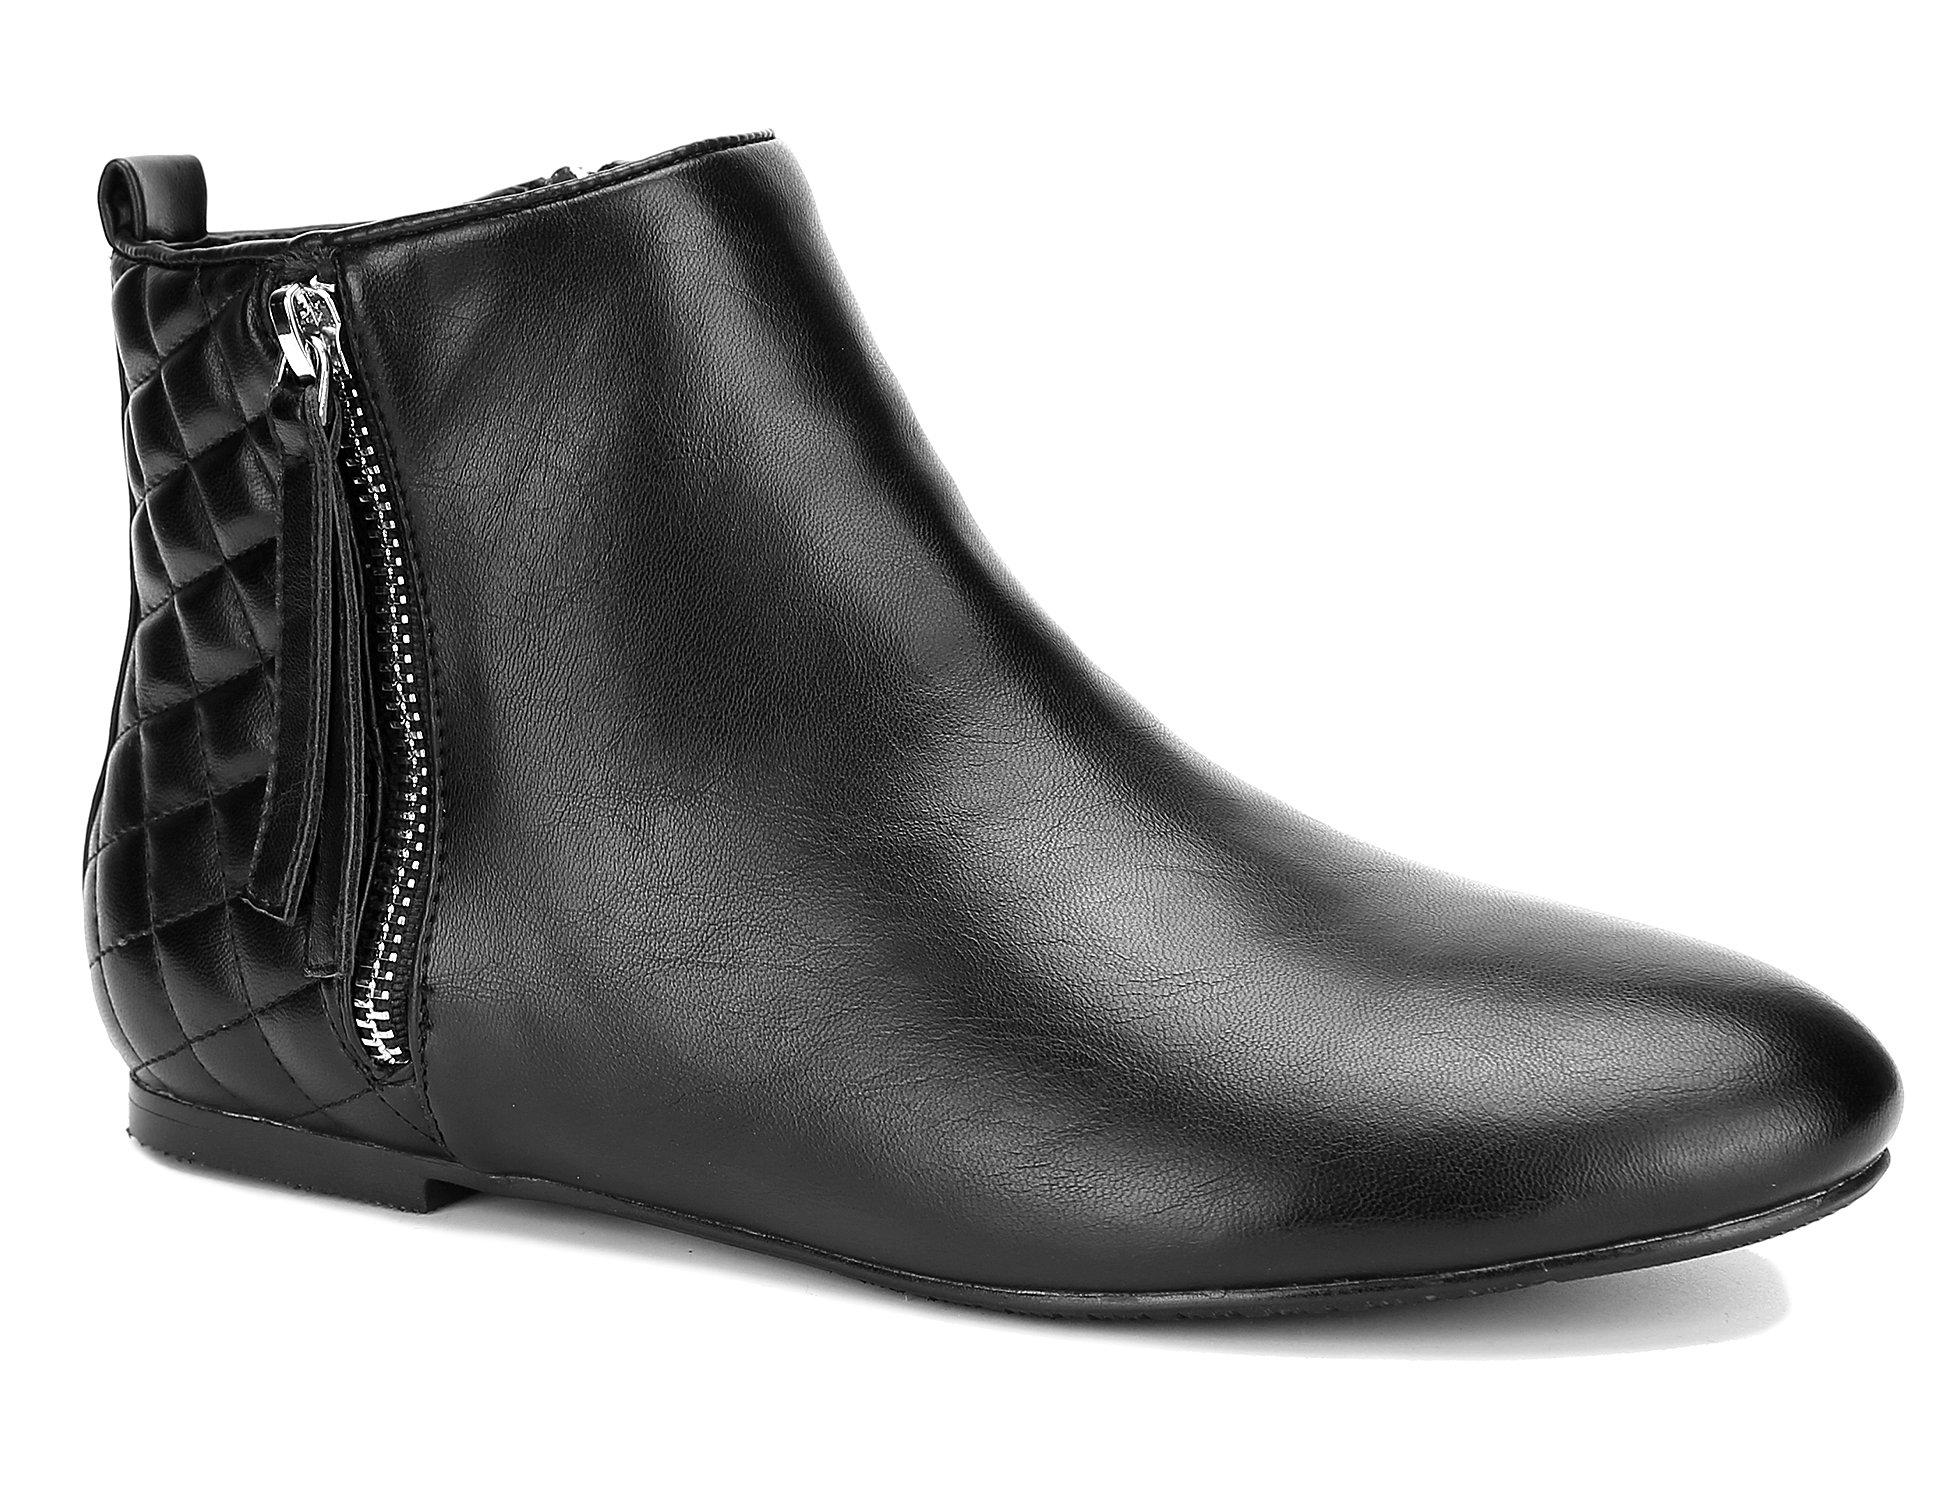 MaxMuxun Women Shoes Flats Classic Ankle Boots (41 EU/10 US, Black PU)